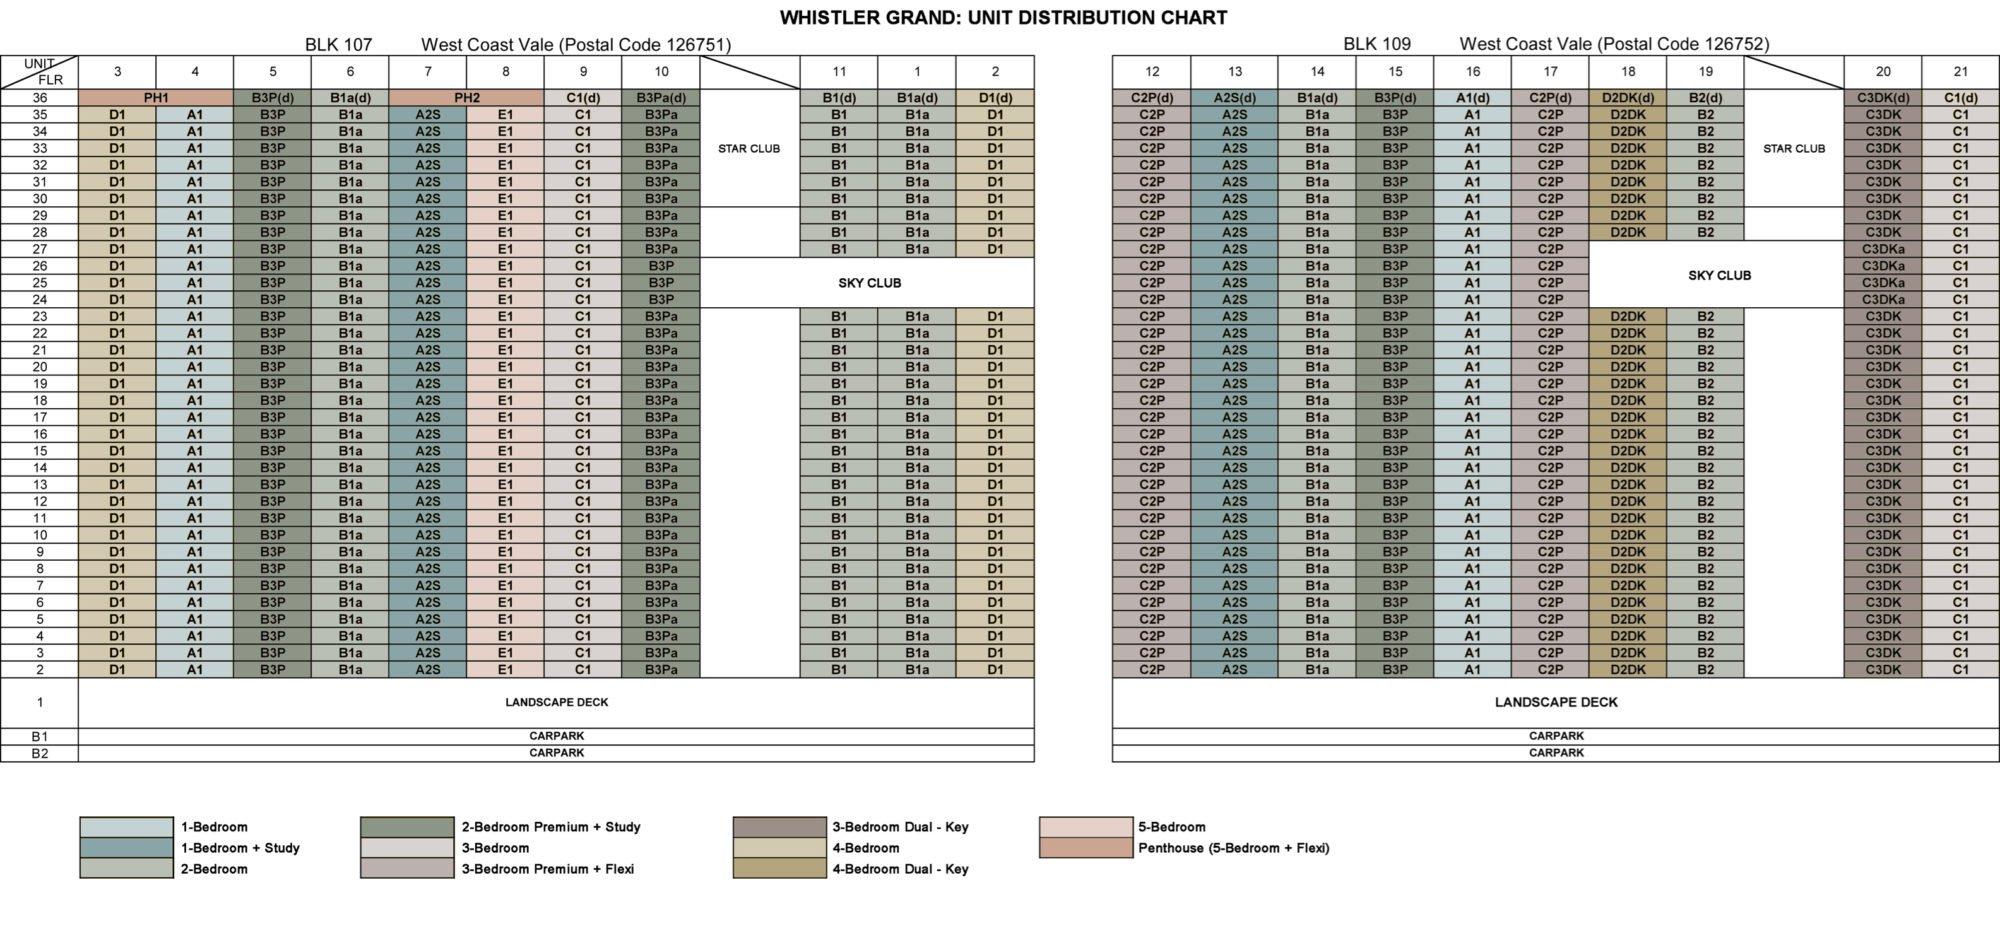 Whistler Grand schematic chart 18 Sep 2018 version